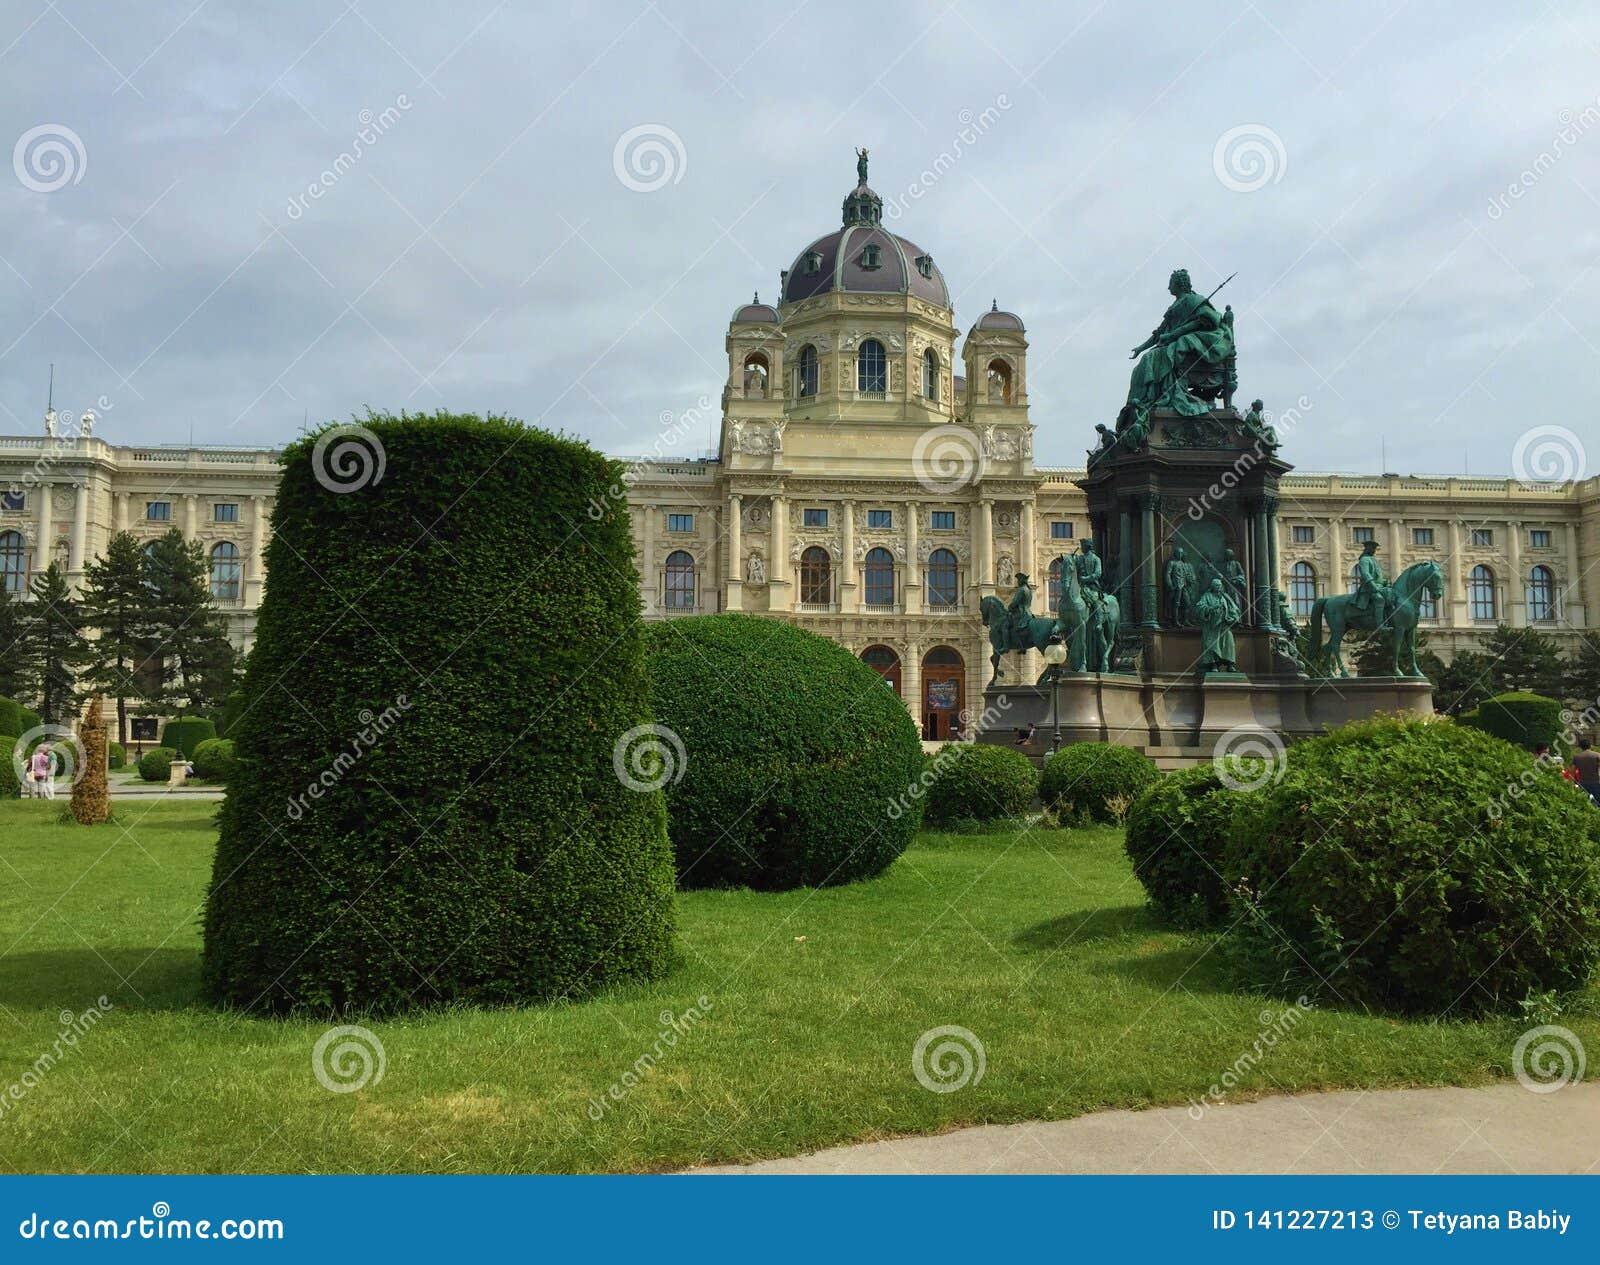 Wien - en av Europa mest besökte städer - Maria Theresa Monument